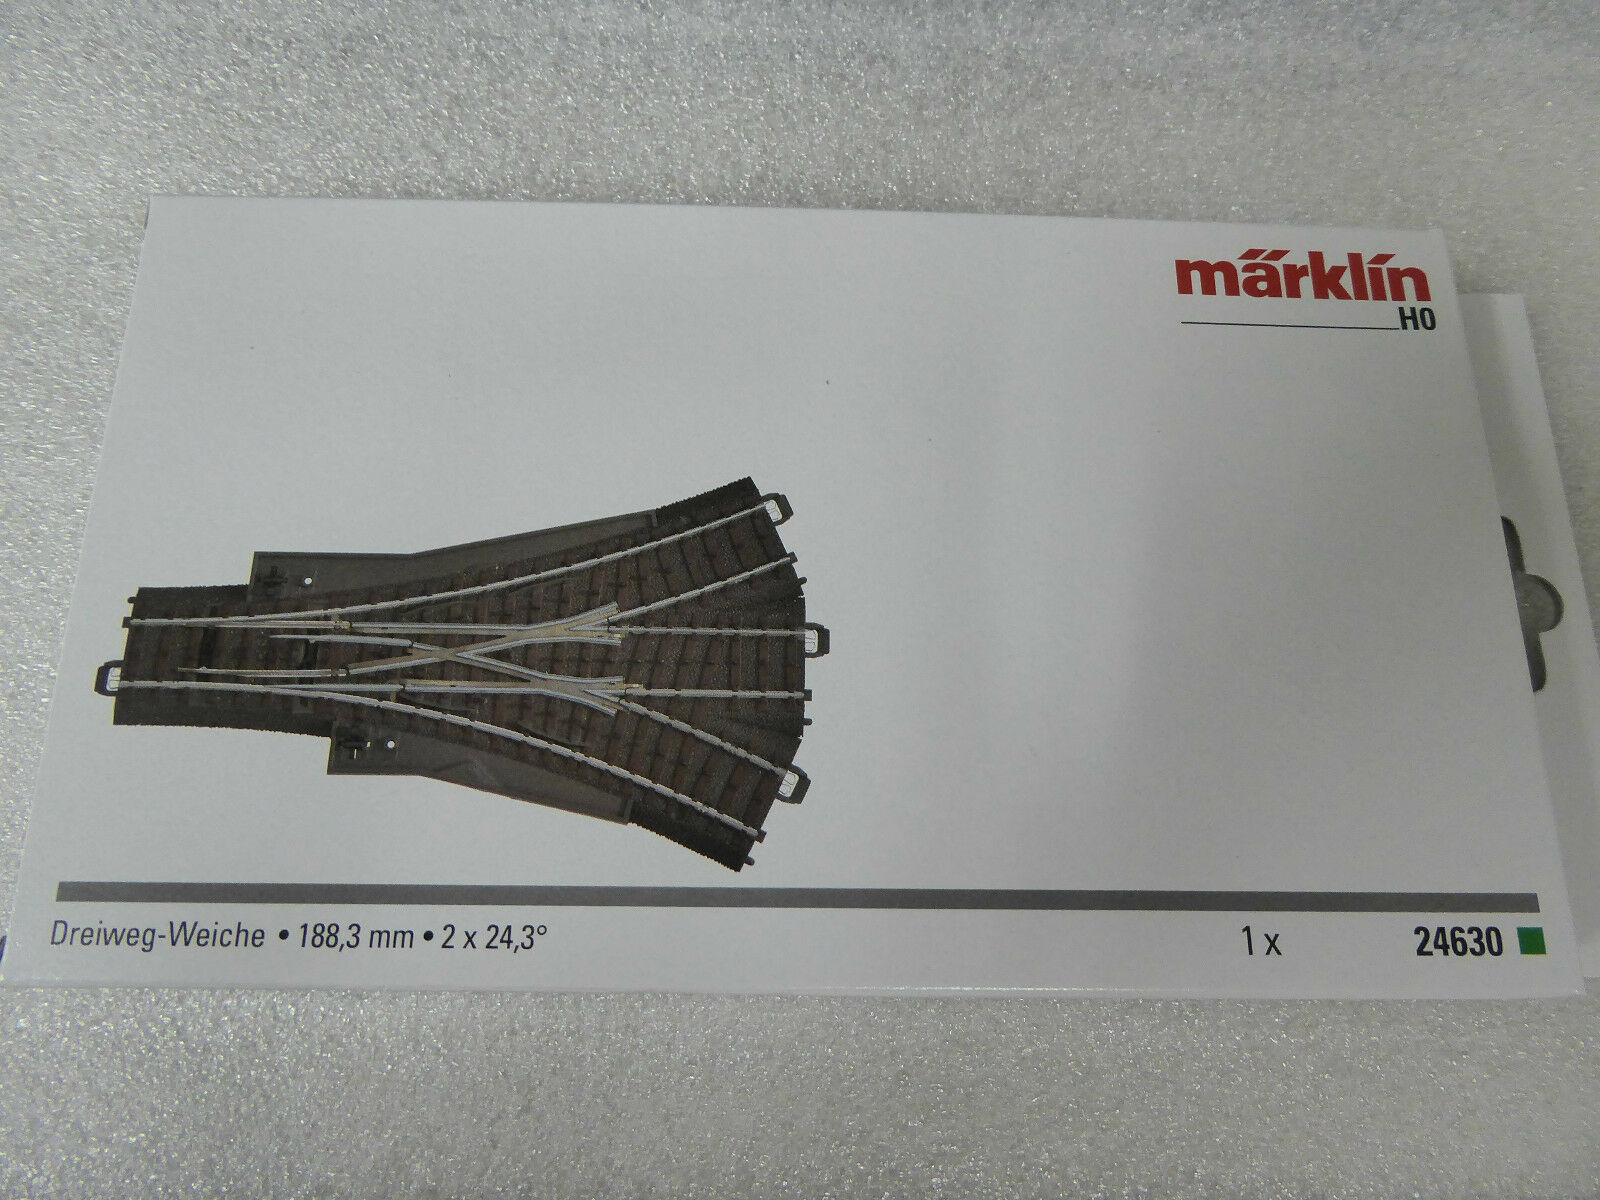 Märklin H0 24630 C-Gleis Dreiwegweiche Neuware